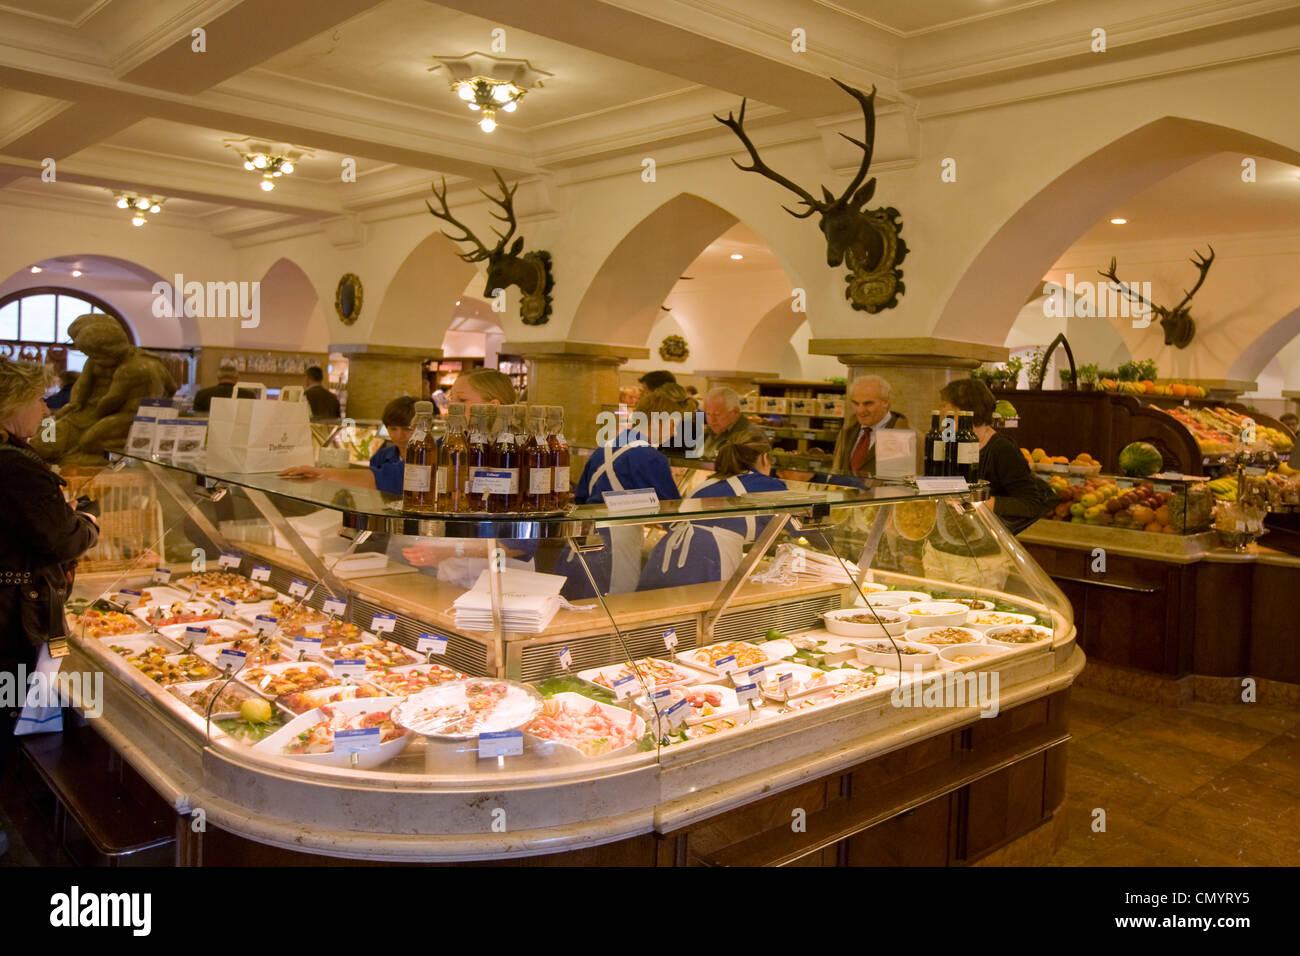 Dahlmeier Feinkost Shop, Kaviar, München, Deutschland Stockbild